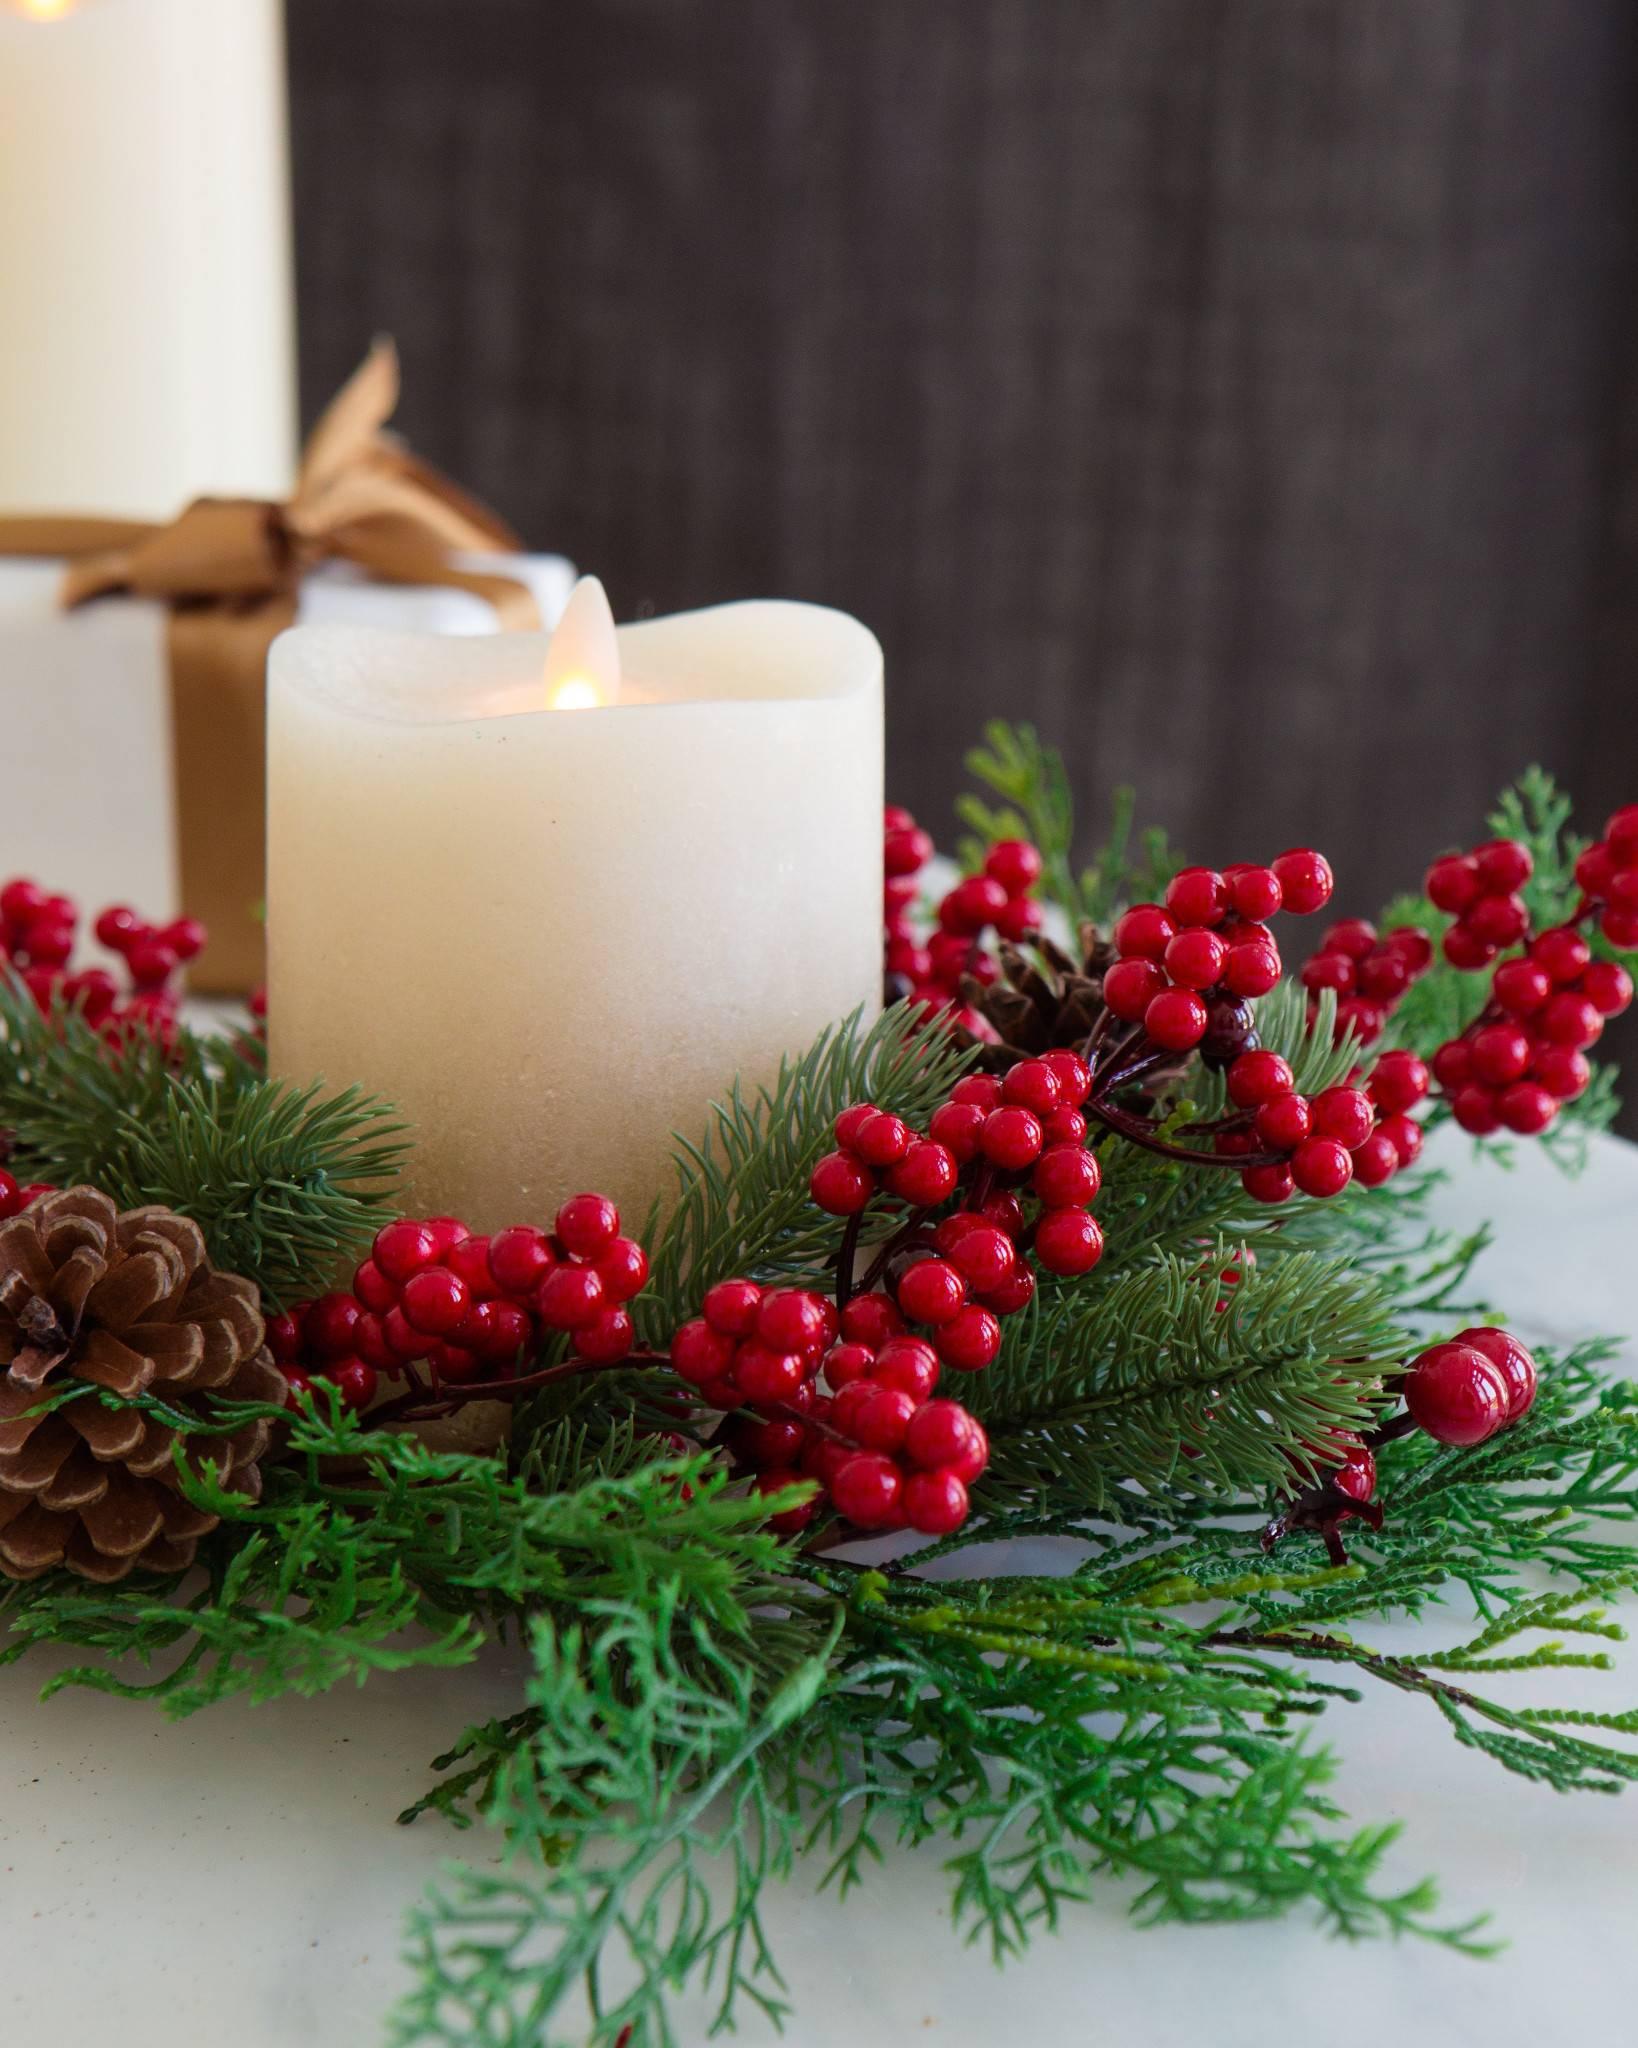 Christmas Candle Rings.Christmas Candle Rings Set Of 3 Balsam Hill Uk